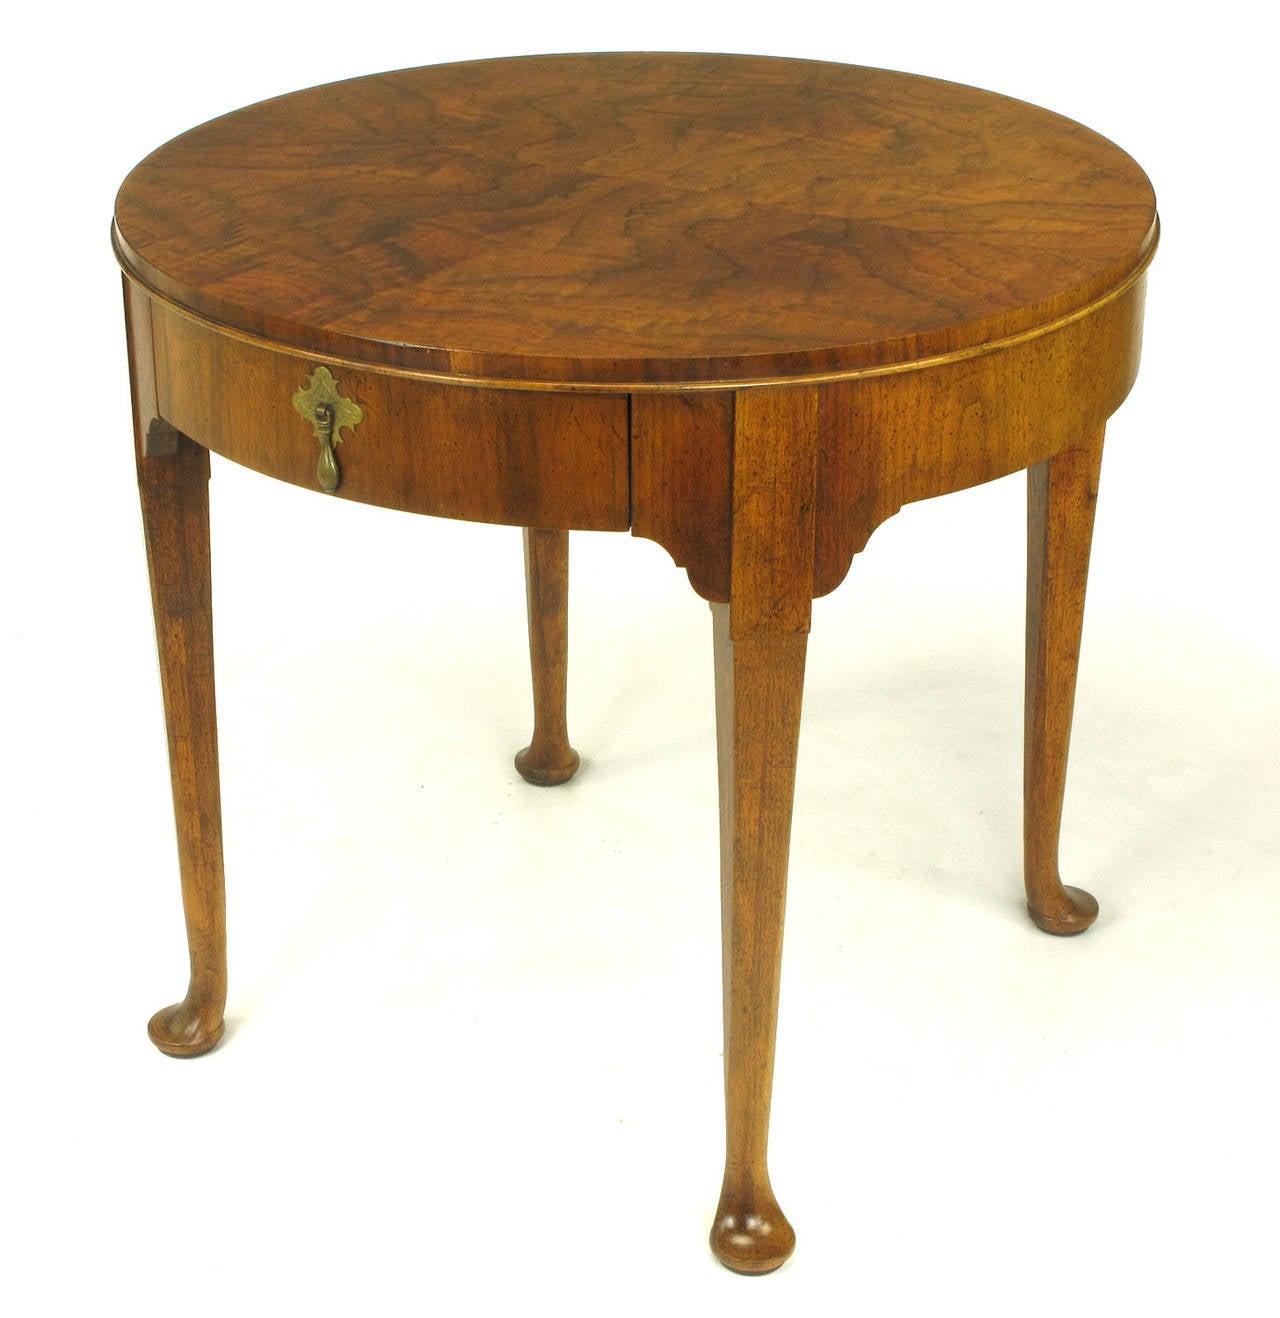 Baker Furniture Milling Road Figured Walnut Regency Side Table